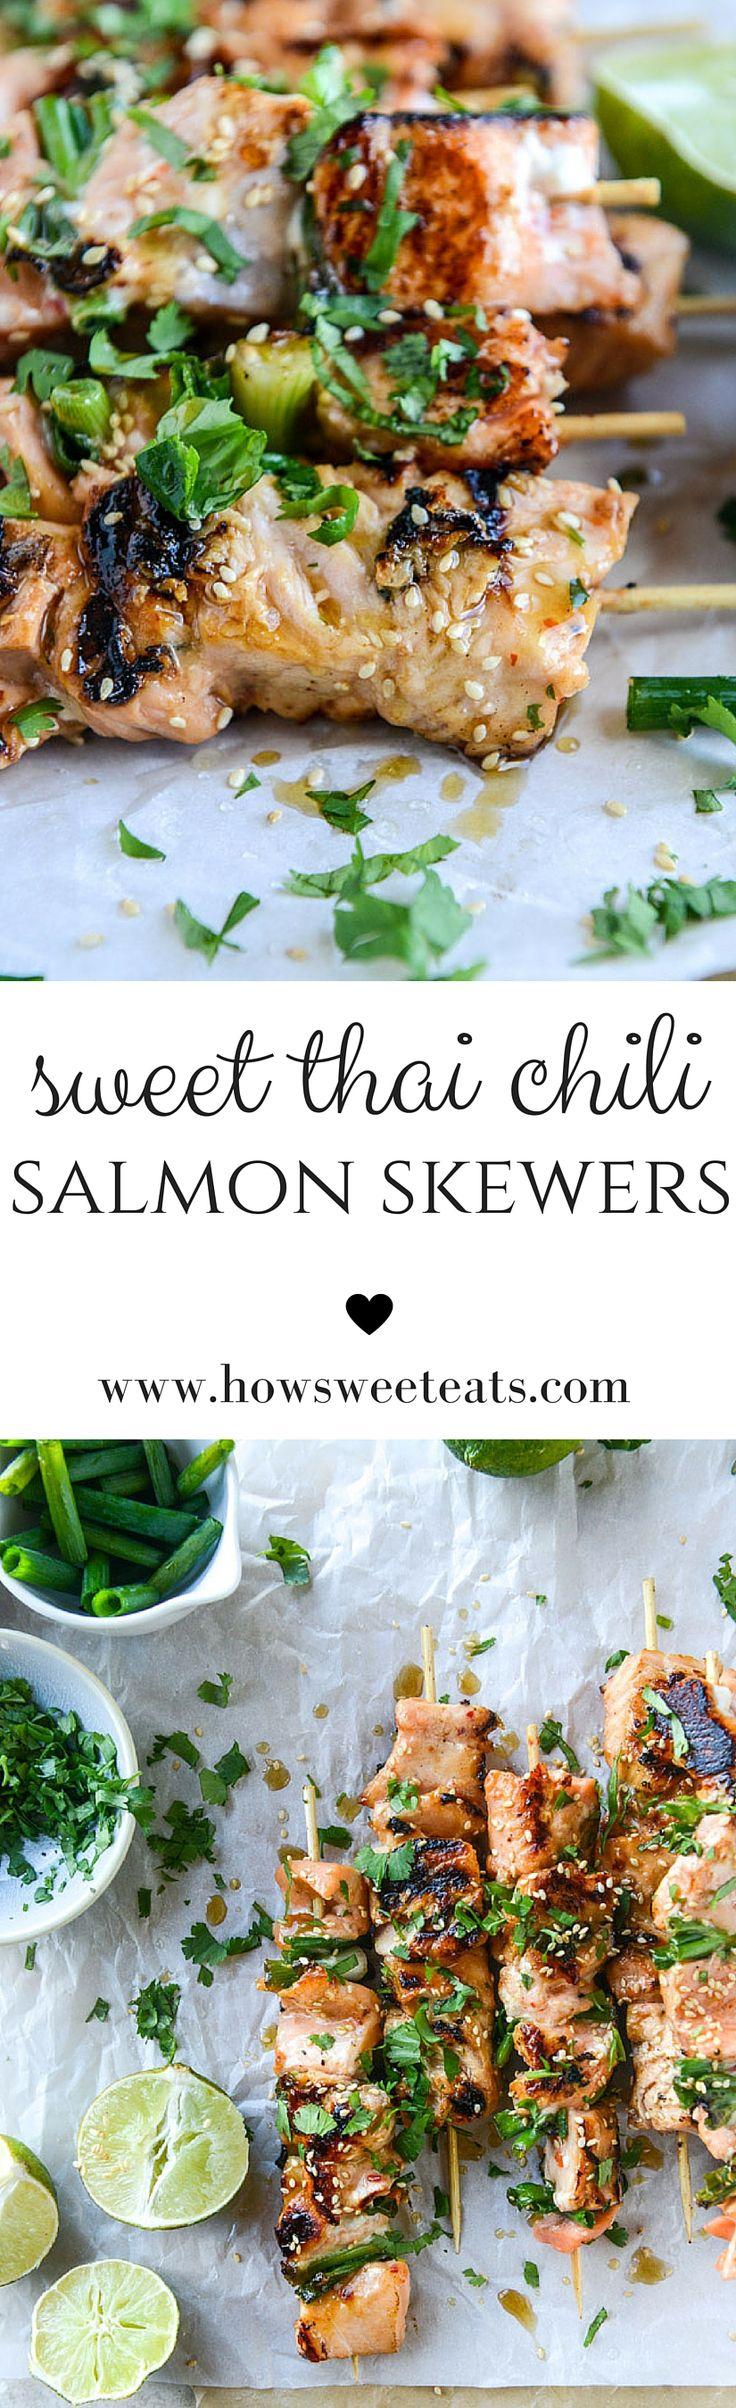 30 minutes sweet thai chili salmon skewers I howsweeteats.com